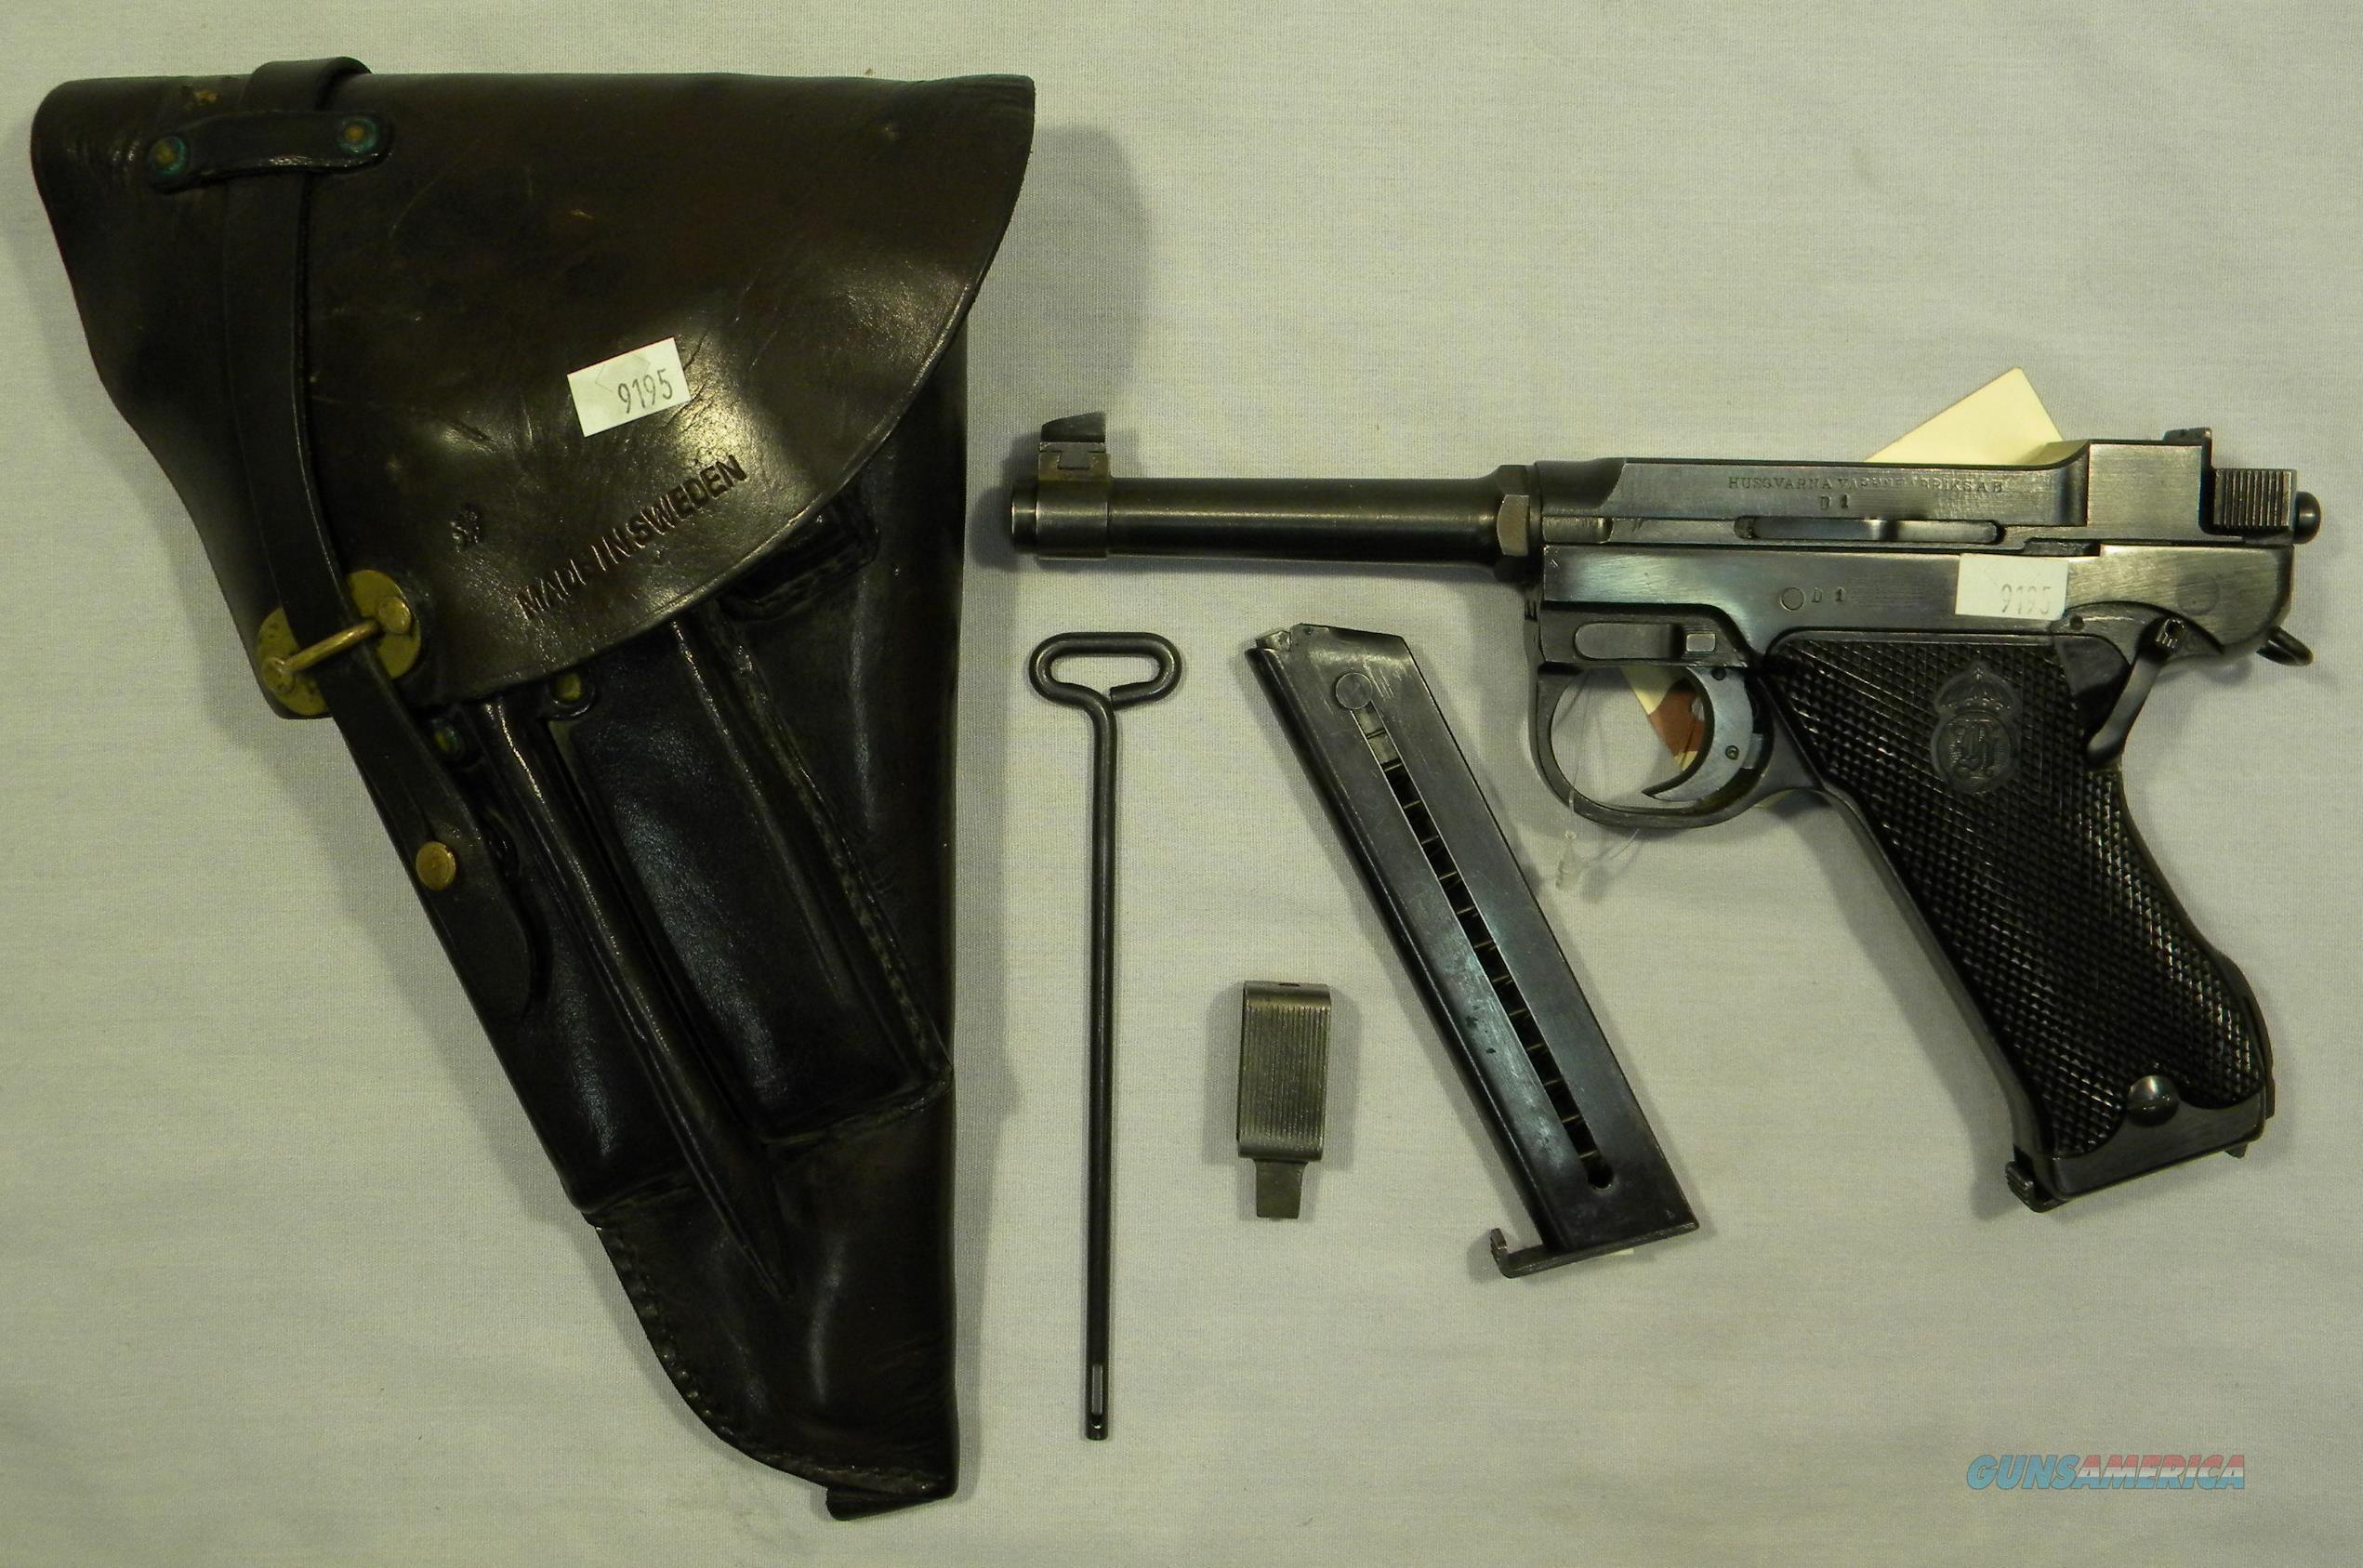 1946 Husqvarna M40, 9mm Semi-Auto Pistol With Holster And Mags  Guns > Pistols > Husqvarna Pistols